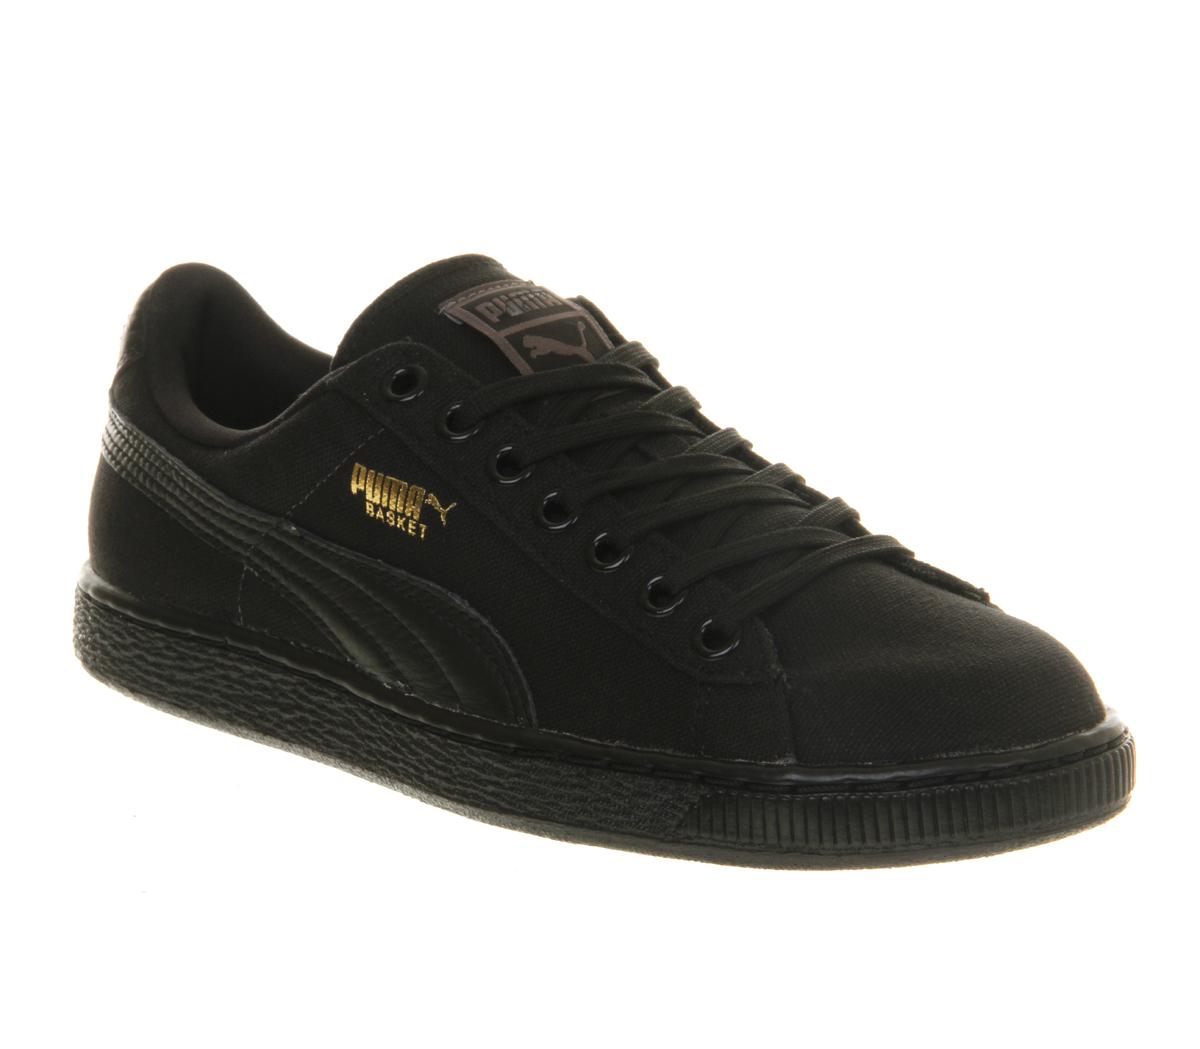 Puma Basket Black Suede